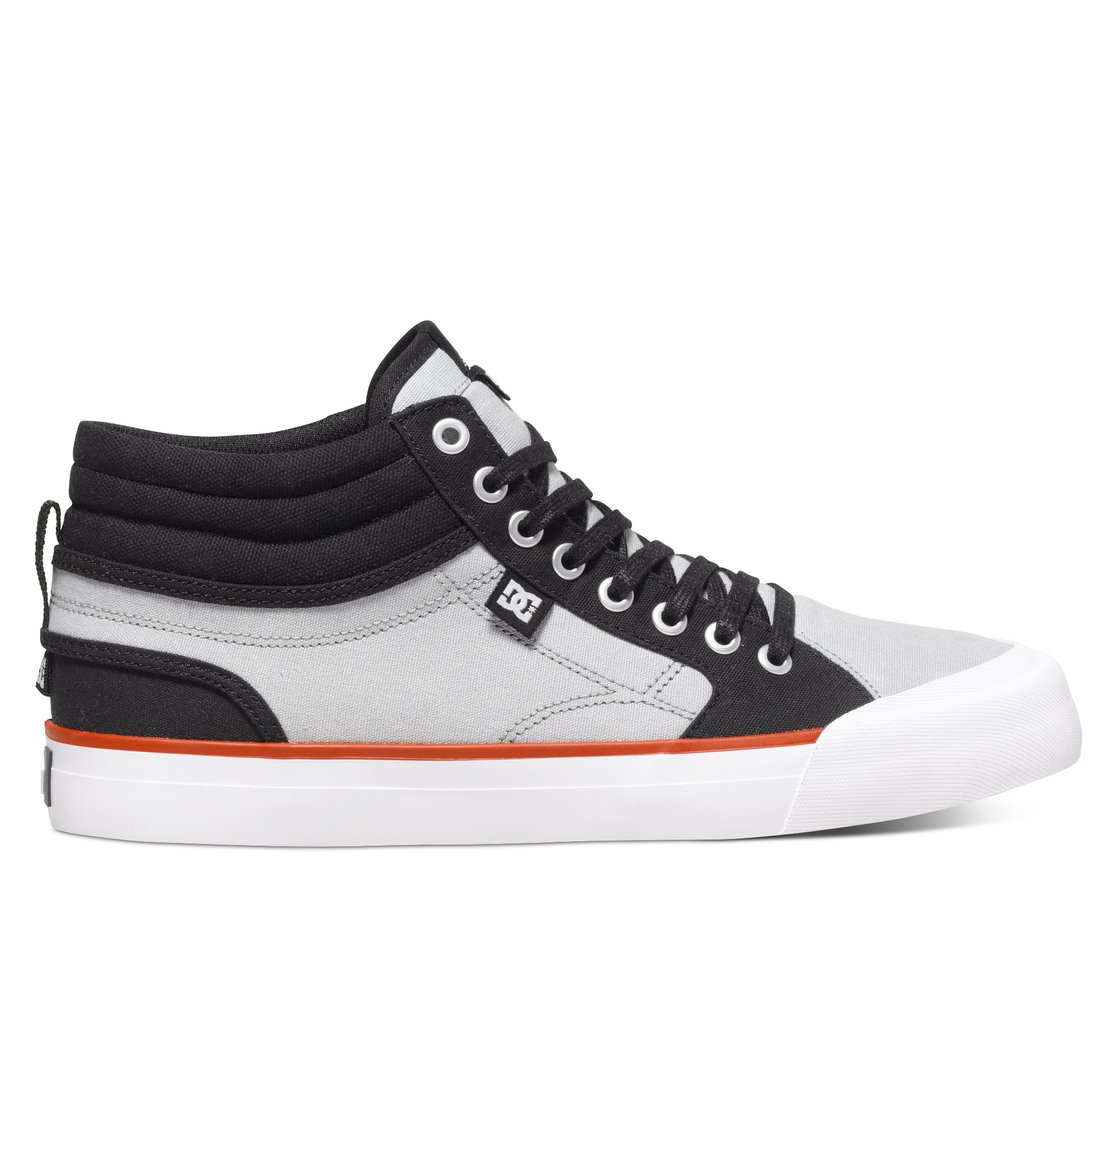 9954a3c365ff 0 Evan Smith Hi - High-Top Shoes for Men ADYS300246 DC Shoes